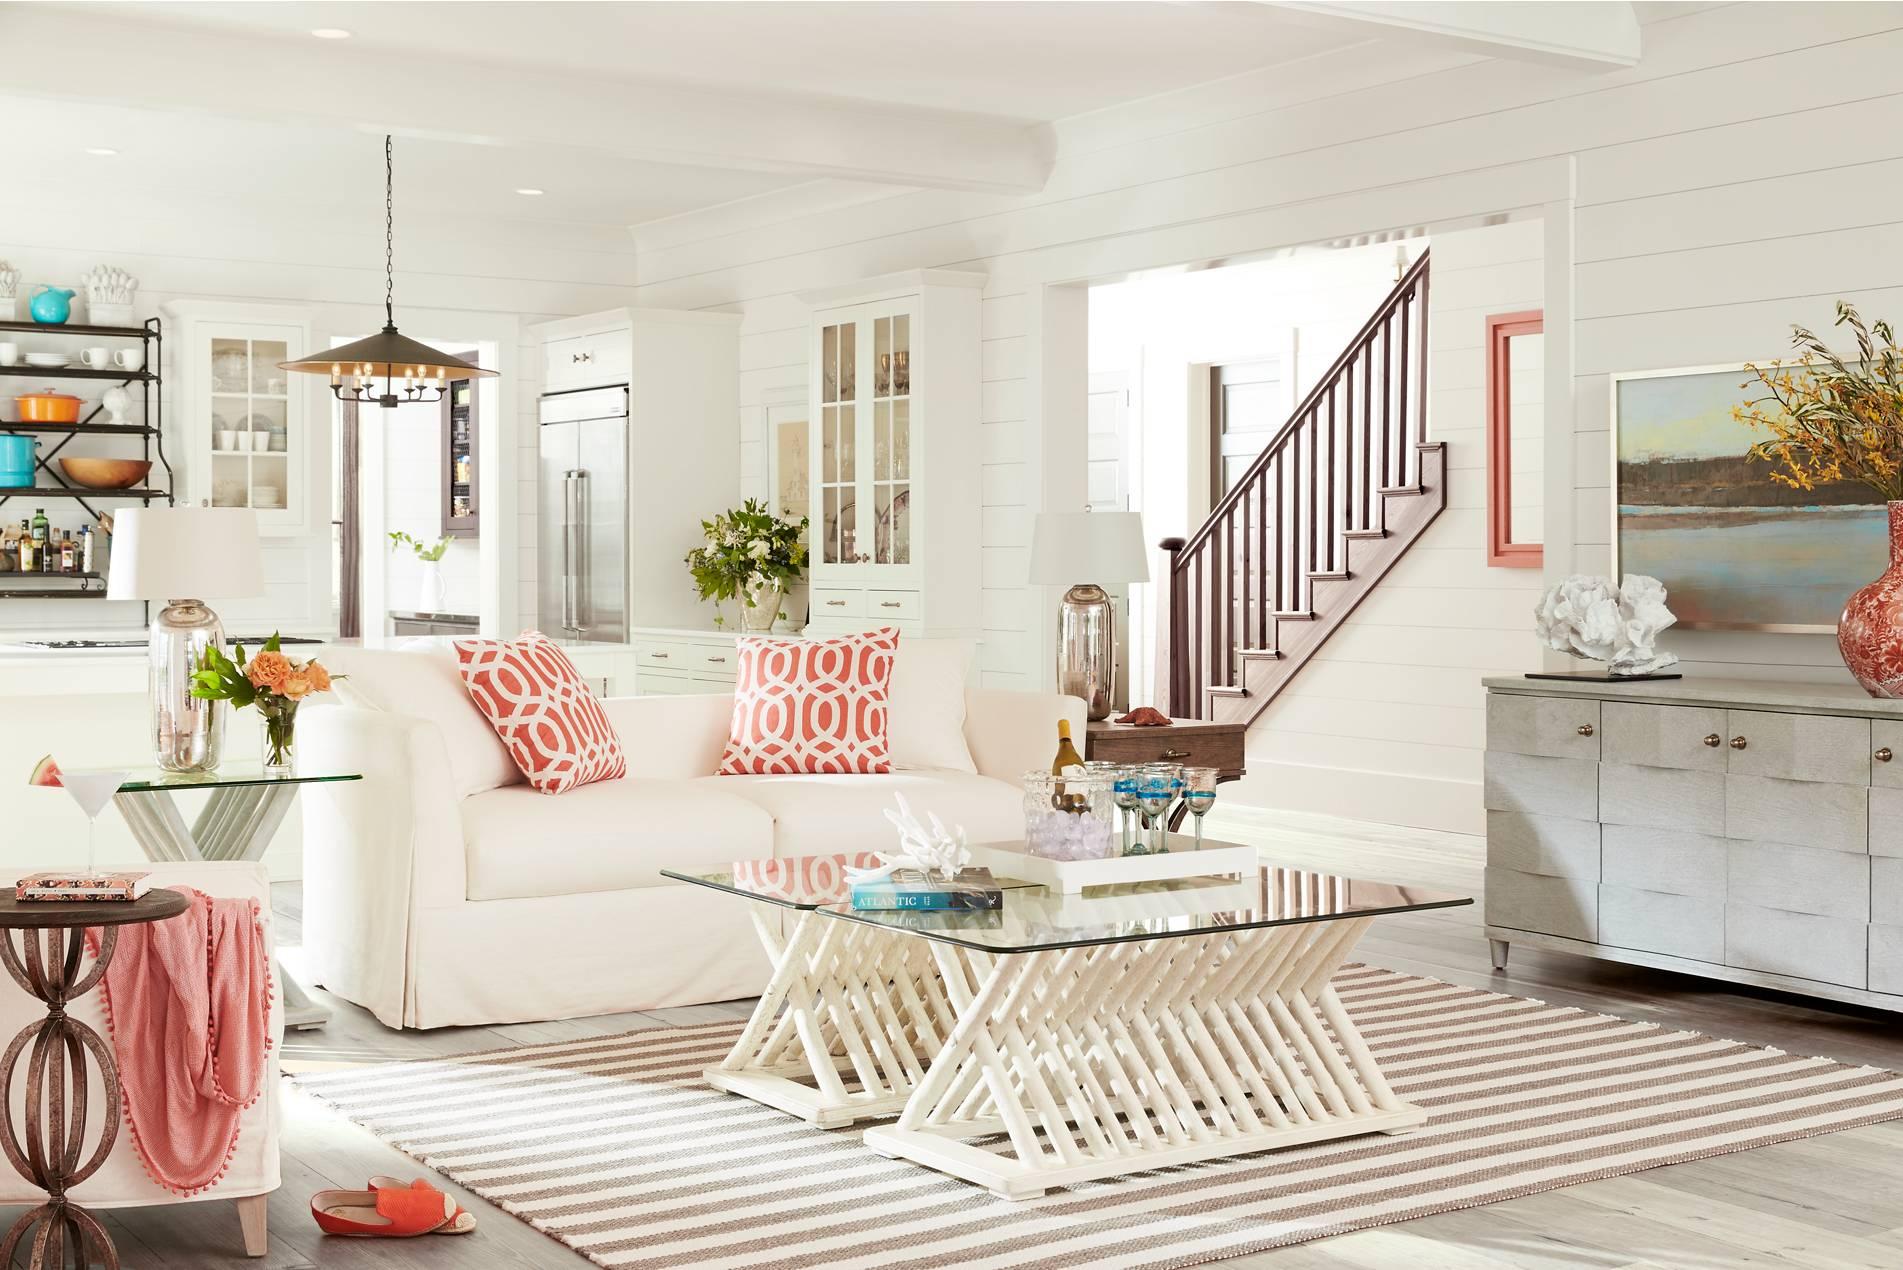 coastal living furniture 1 collection 2 2 collection video. coastal living resort JPFTWDN